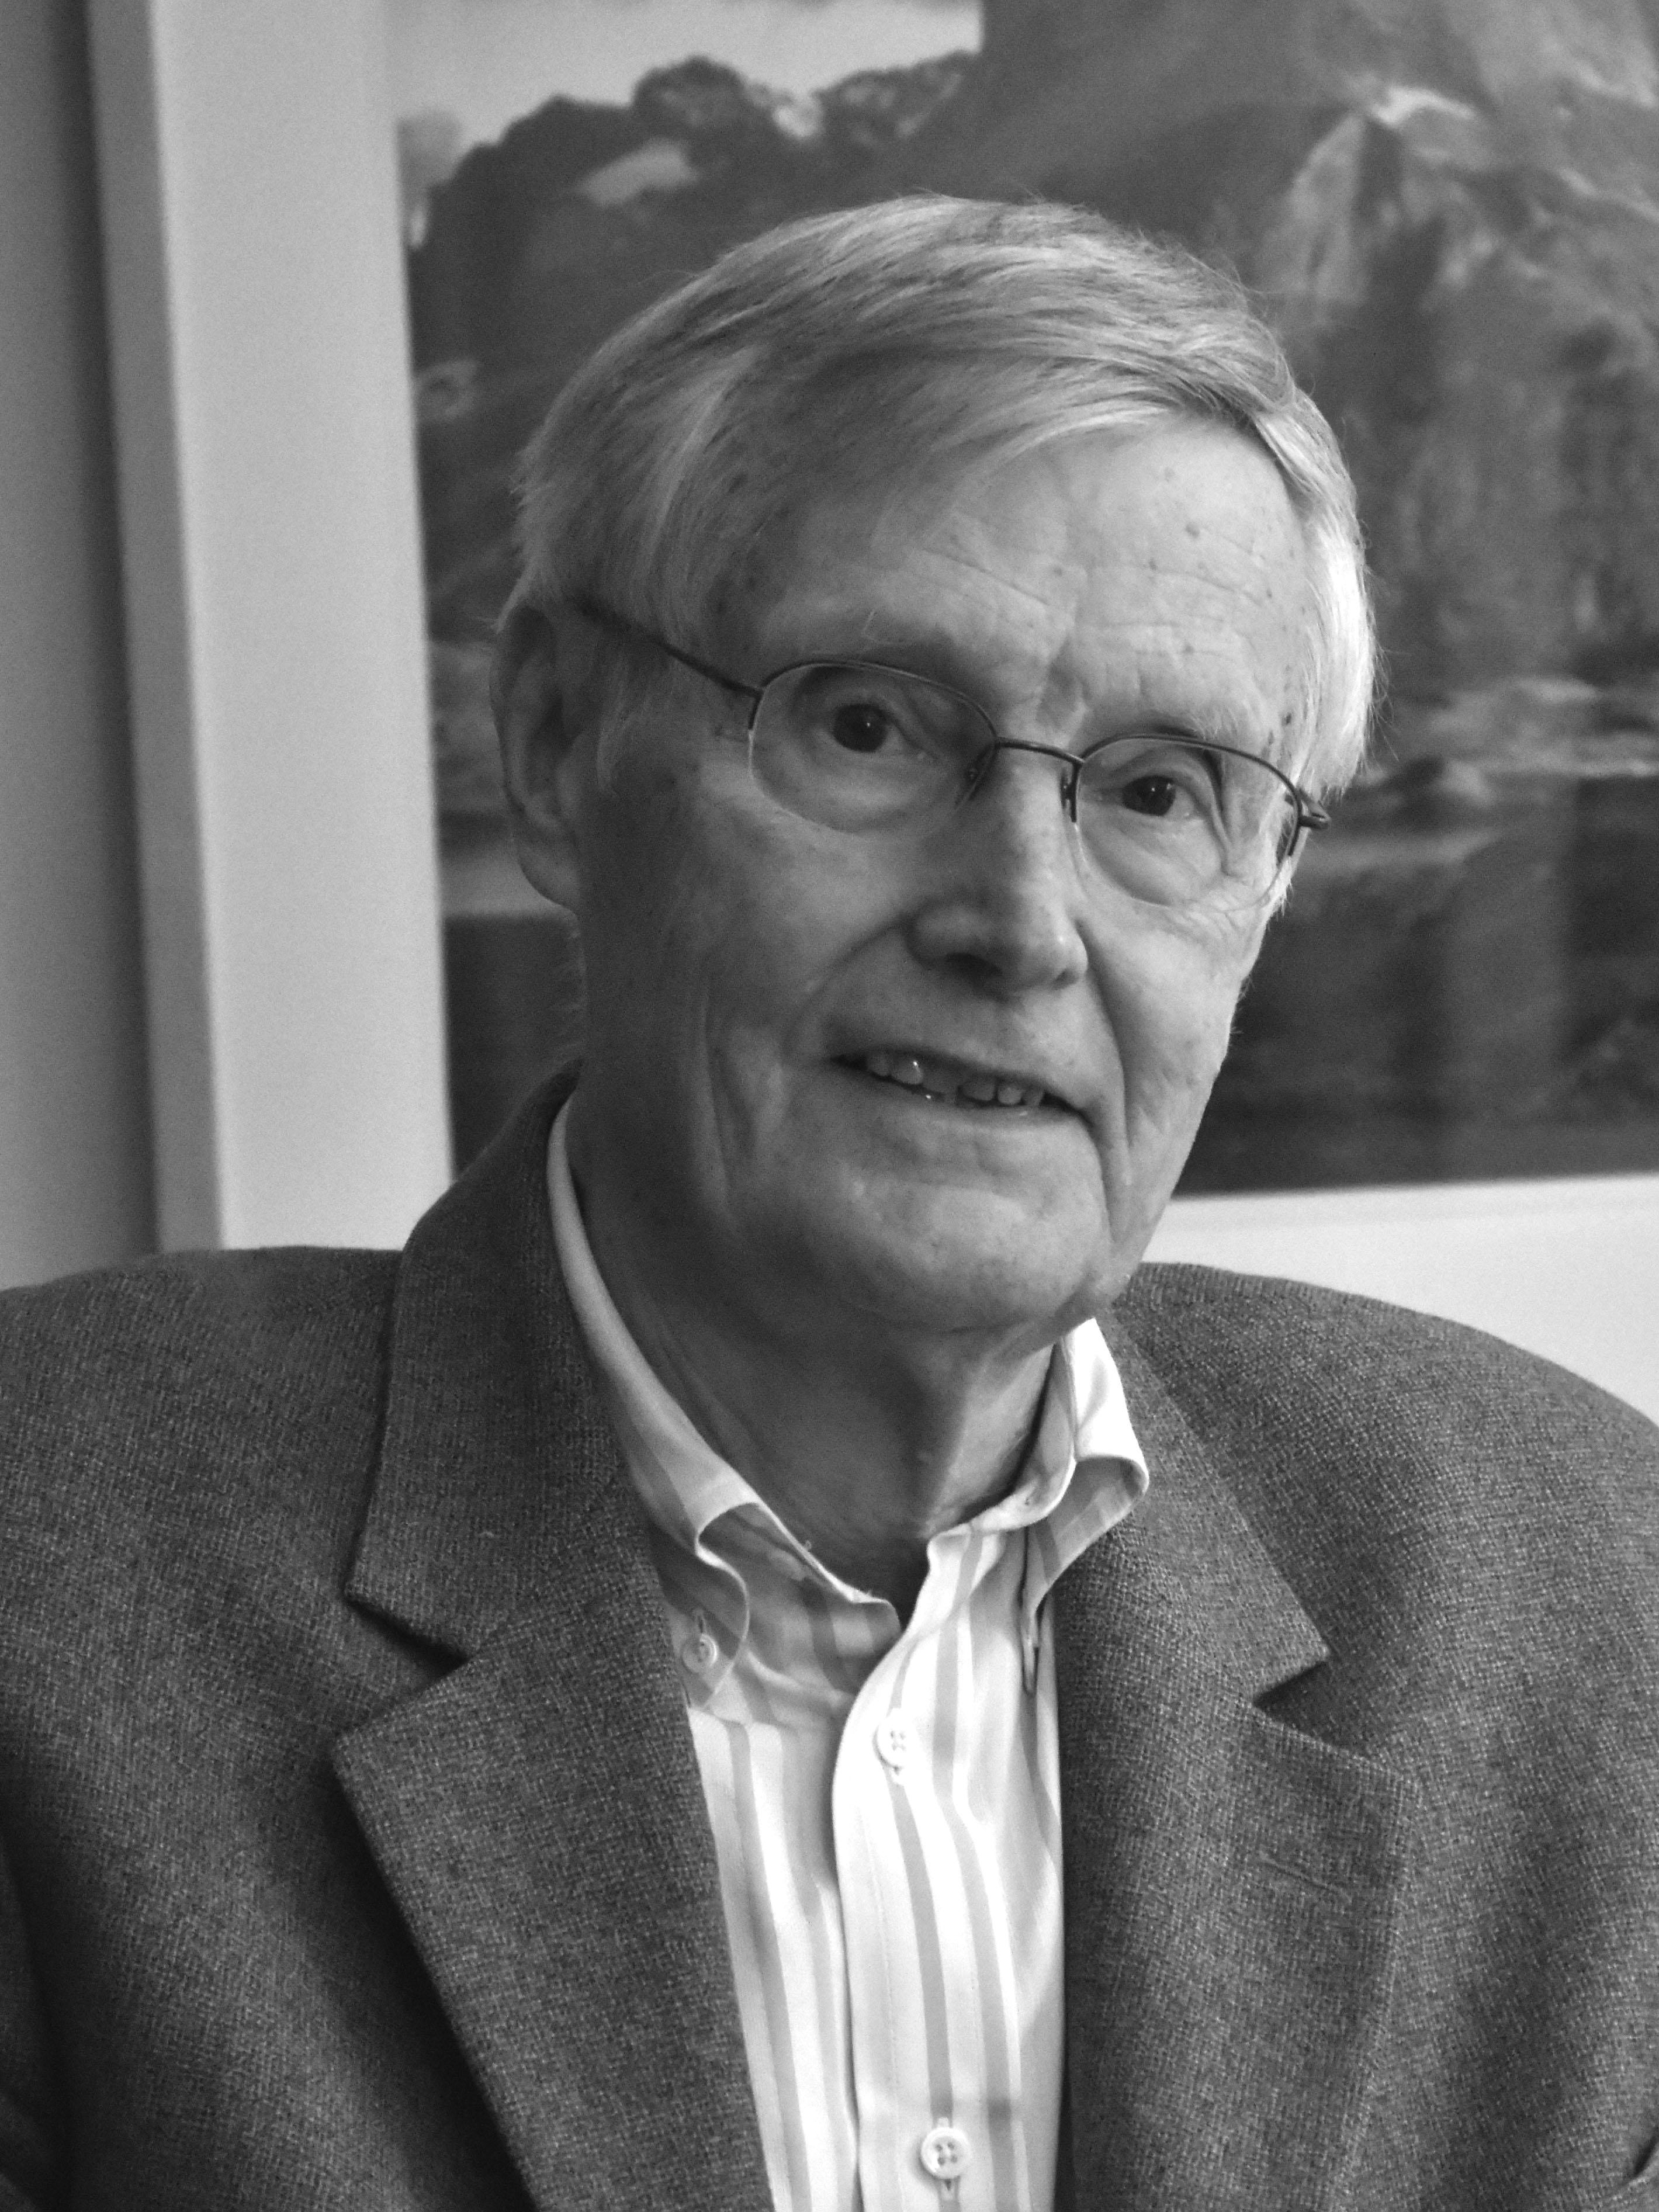 Dr. Robert DuPont, Board Member at Mentor Foundation USA